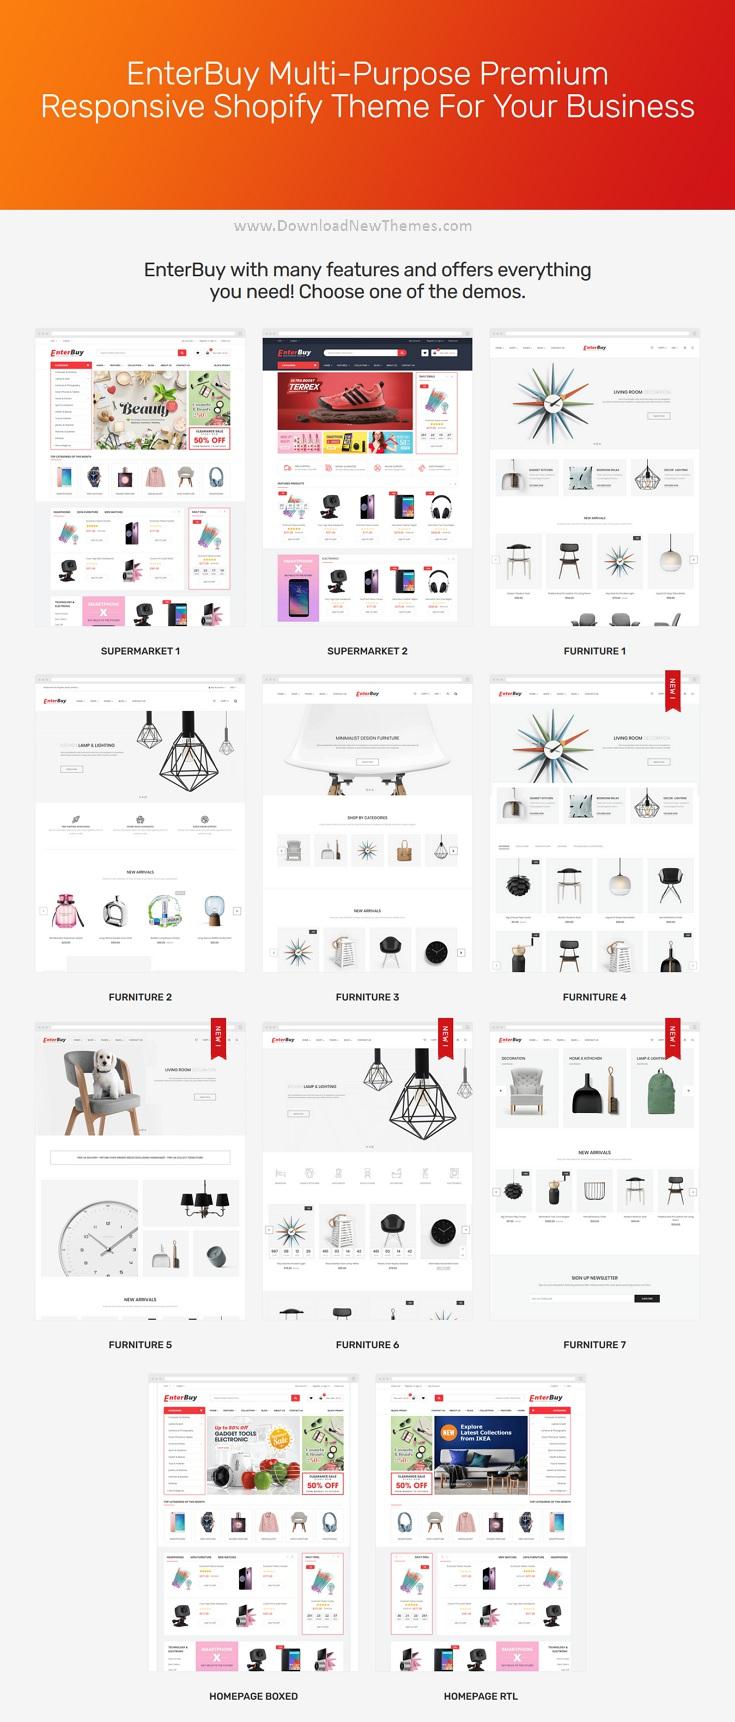 Responsive Multipurpose Premium Shopify Theme